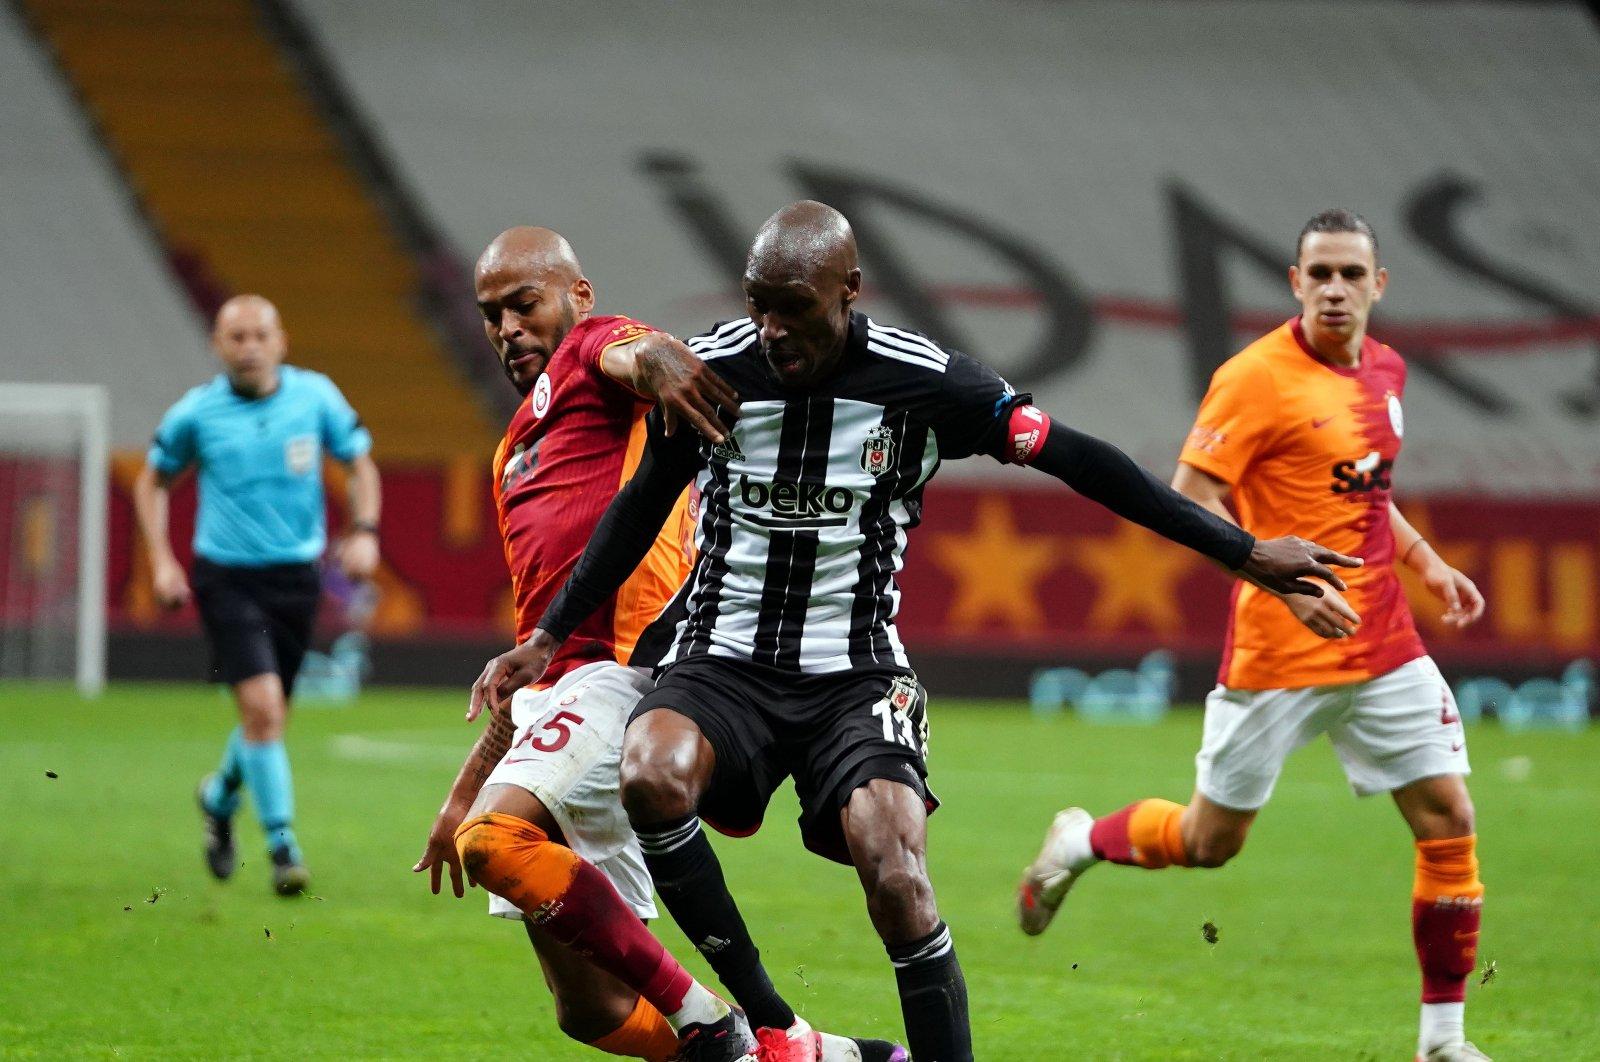 Galatasaray's Marcao (L) and Beşiktaş's Atiba Hutchinson compete for the ball during a Turkish Süper Lig match at Türk Telekom Arena in Istanbul, Turkey, May 8, 2021. (IHA Photo)